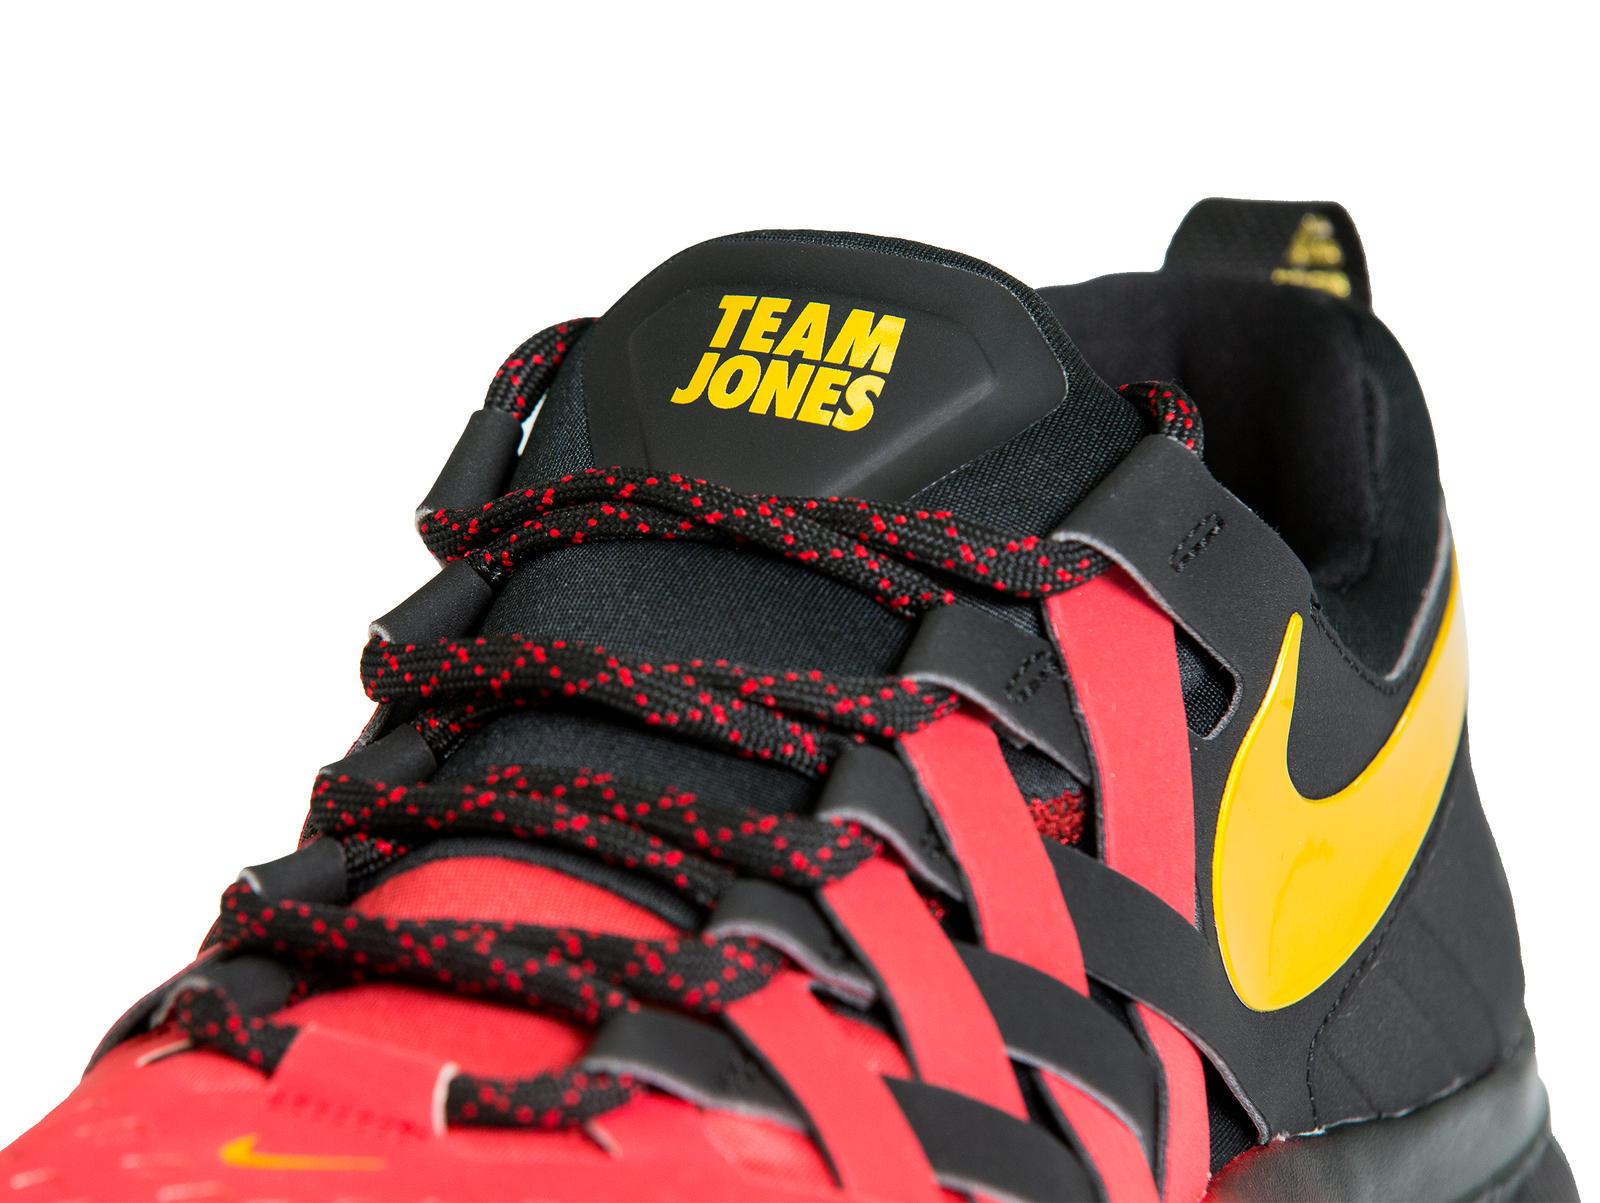 Jon Jones Nike Shoes